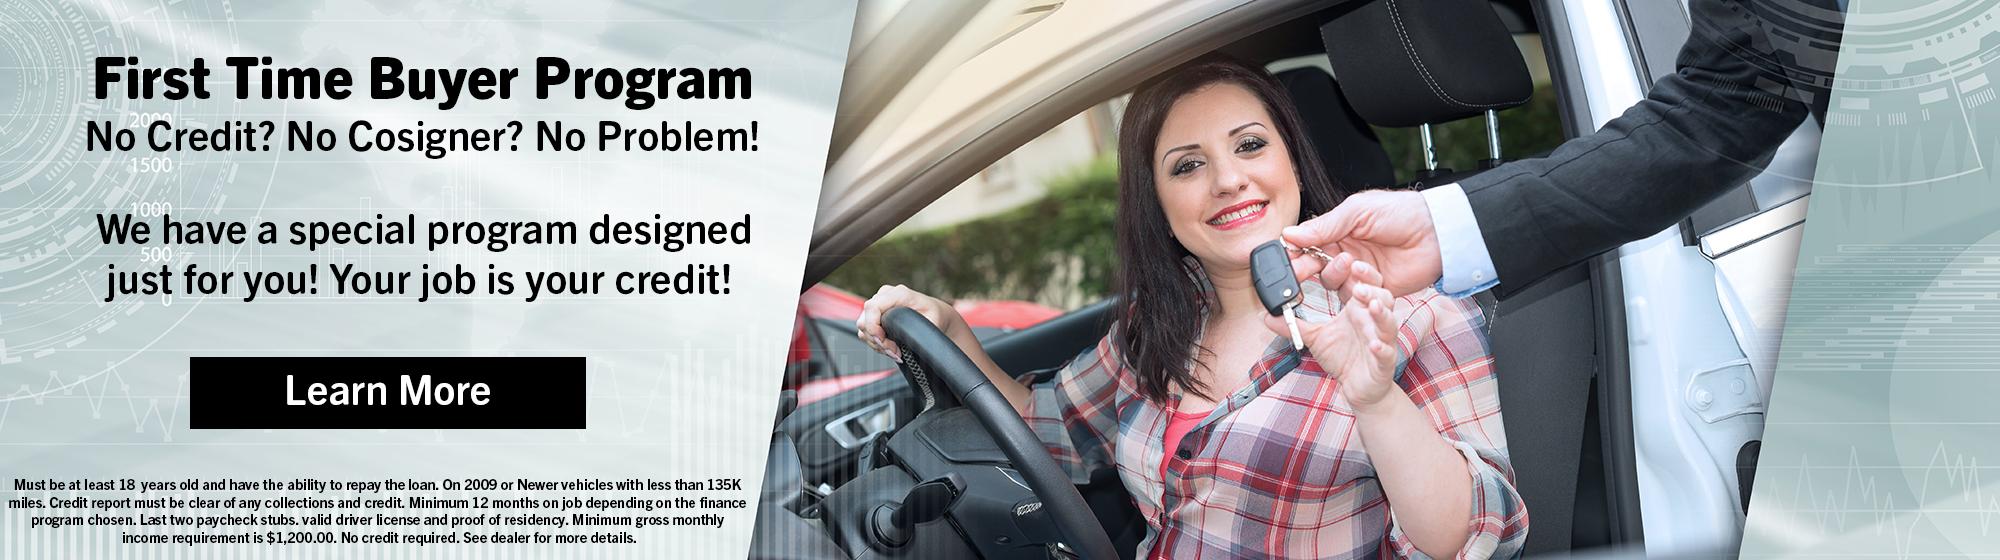 first-time-car-buyer-program